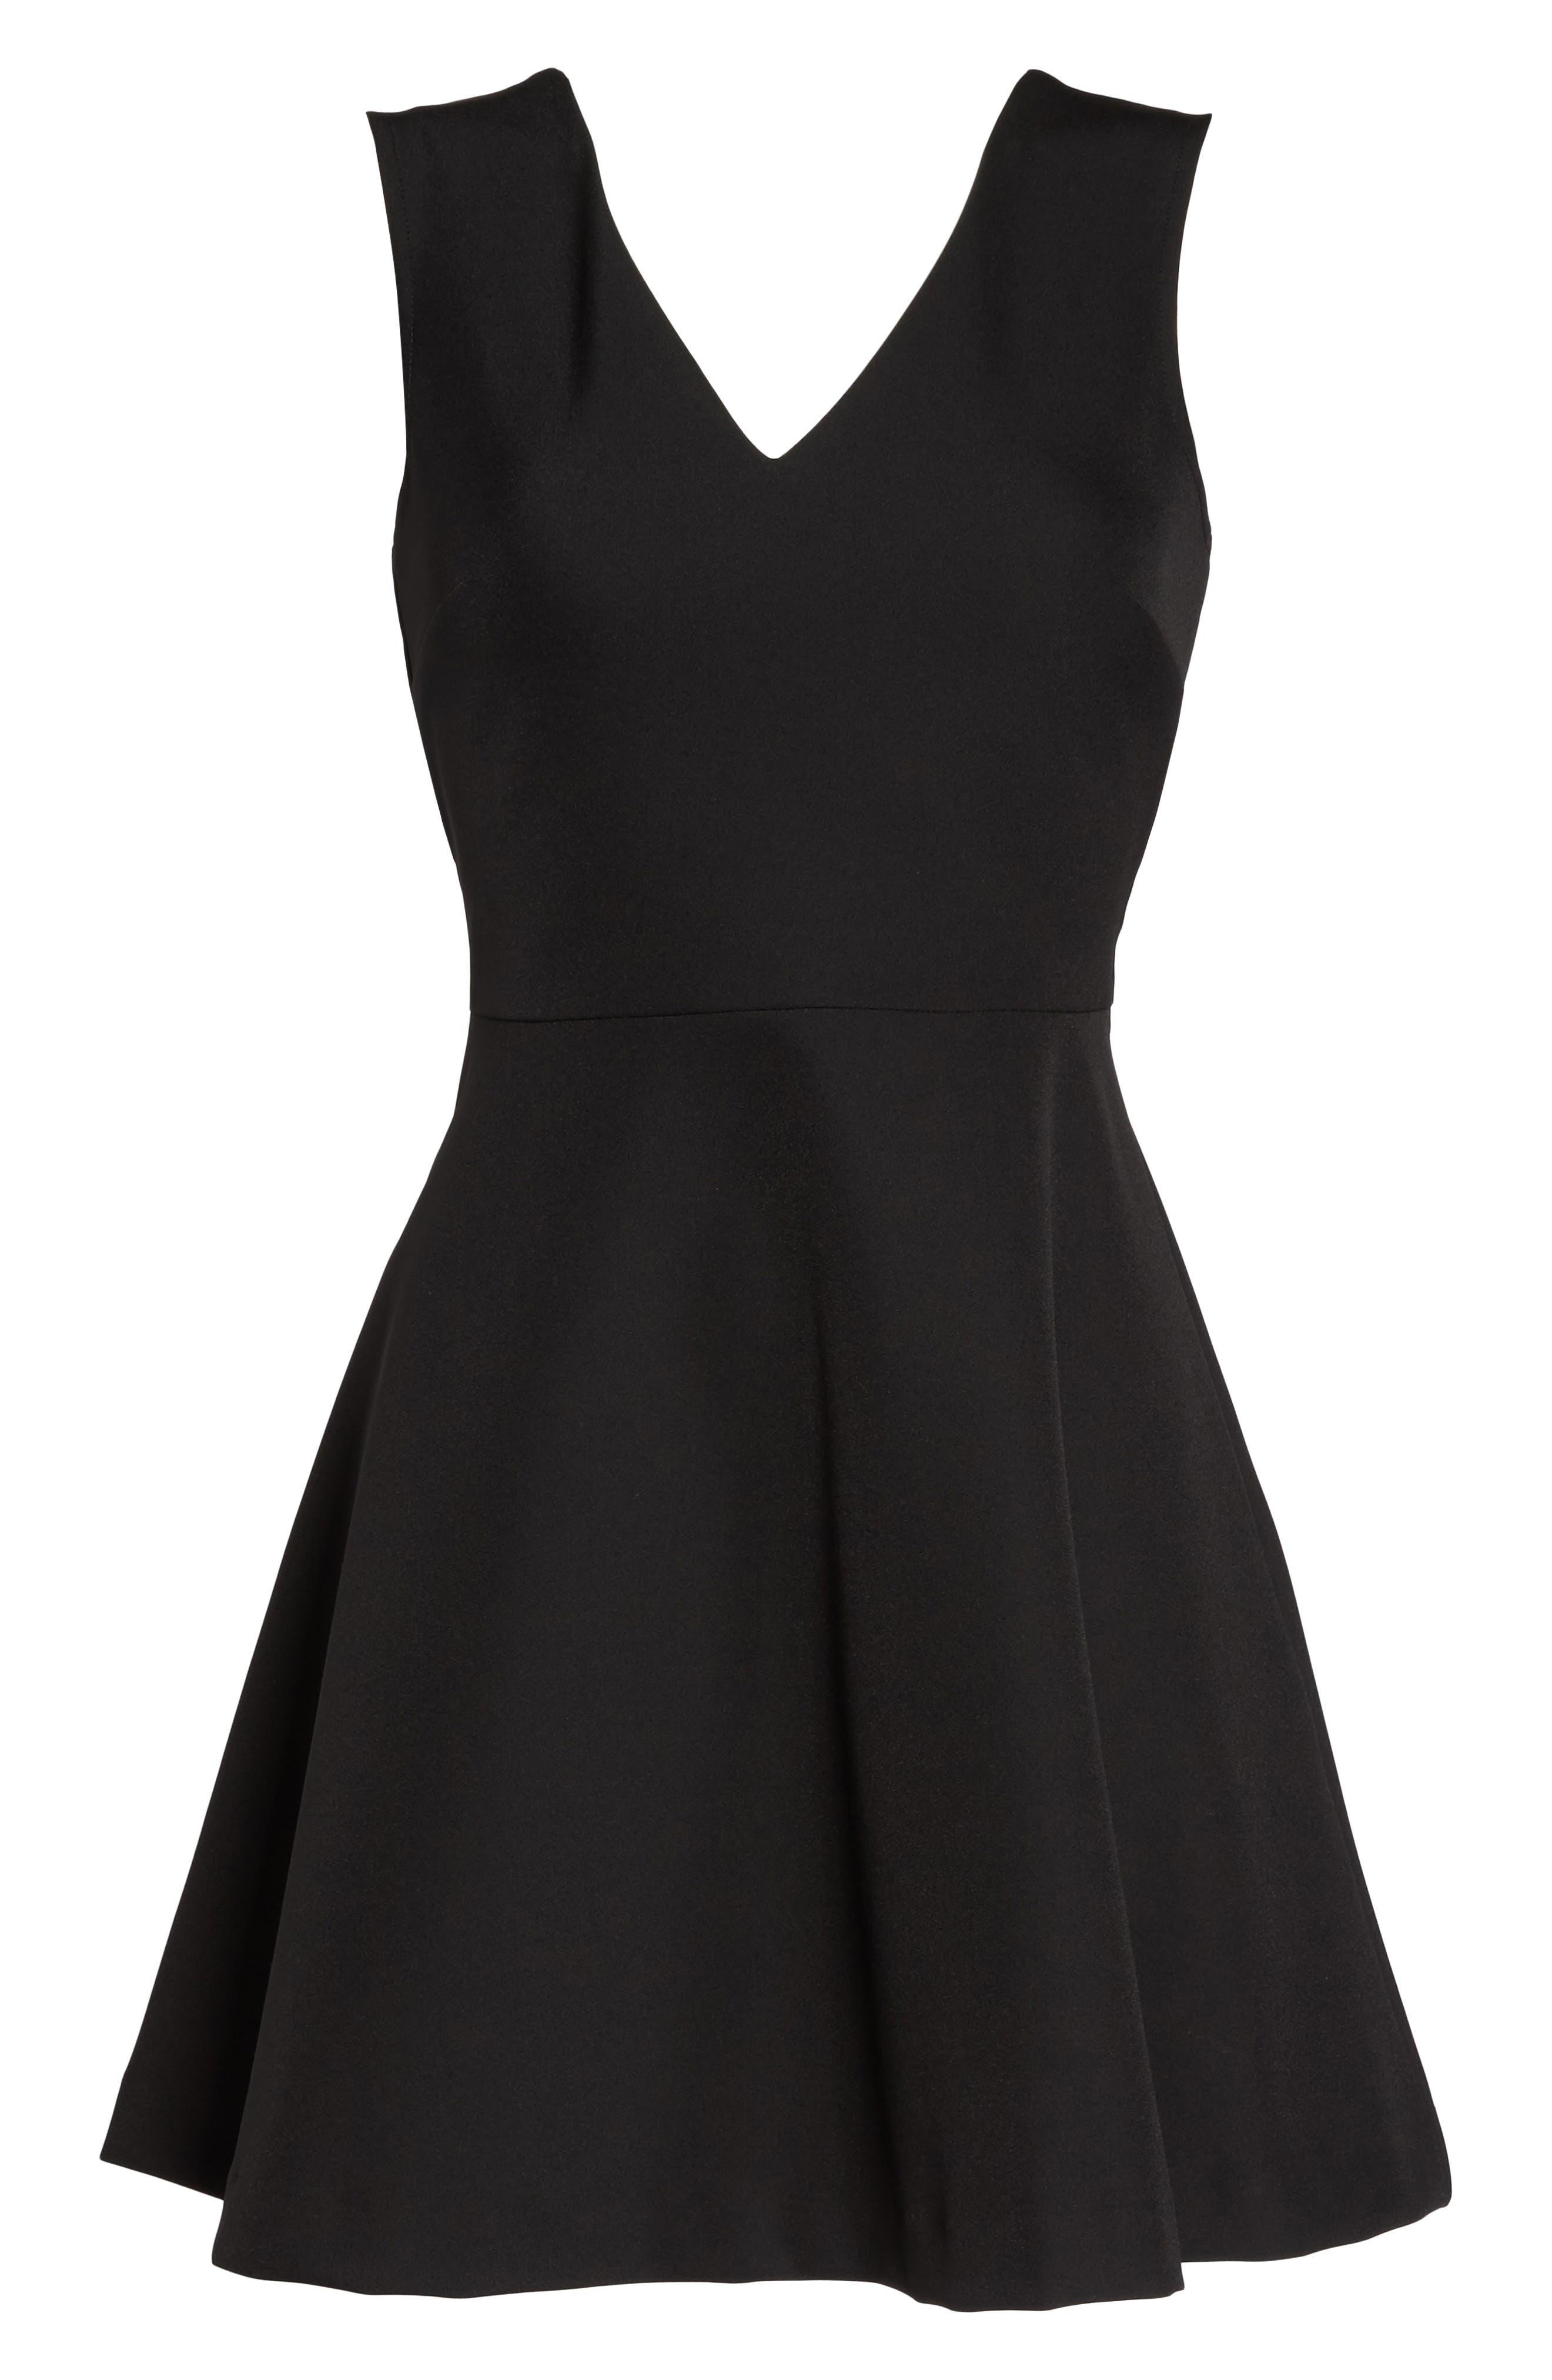 Bianca Back Cutout Fit & Flare Dress,                             Alternate thumbnail 7, color,                             Black